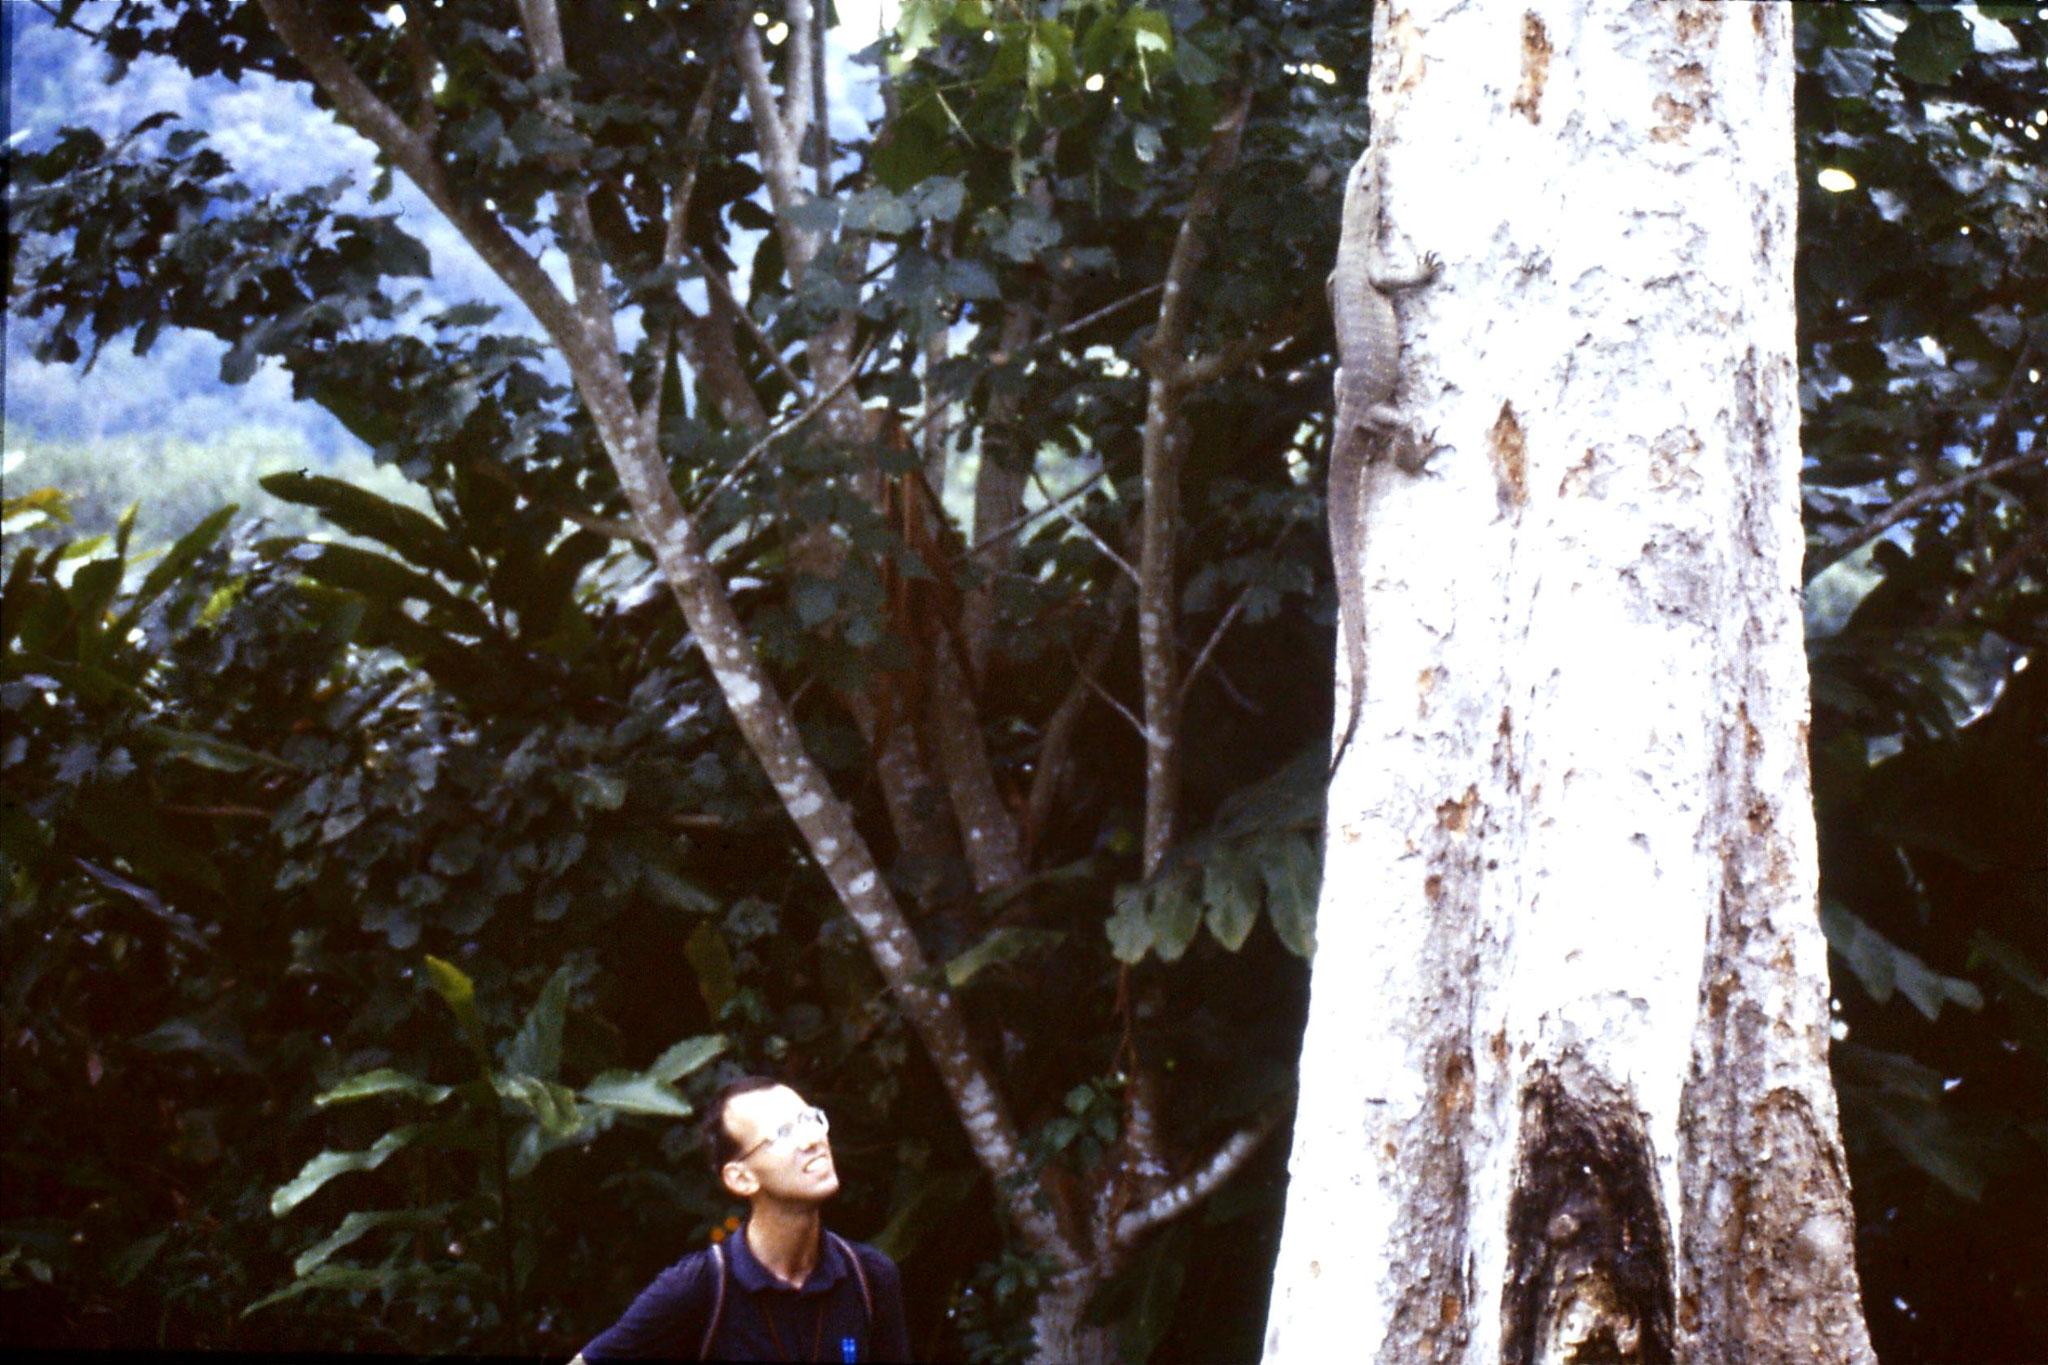 22/6/1990: 31: Tamen Negara monitor lizard